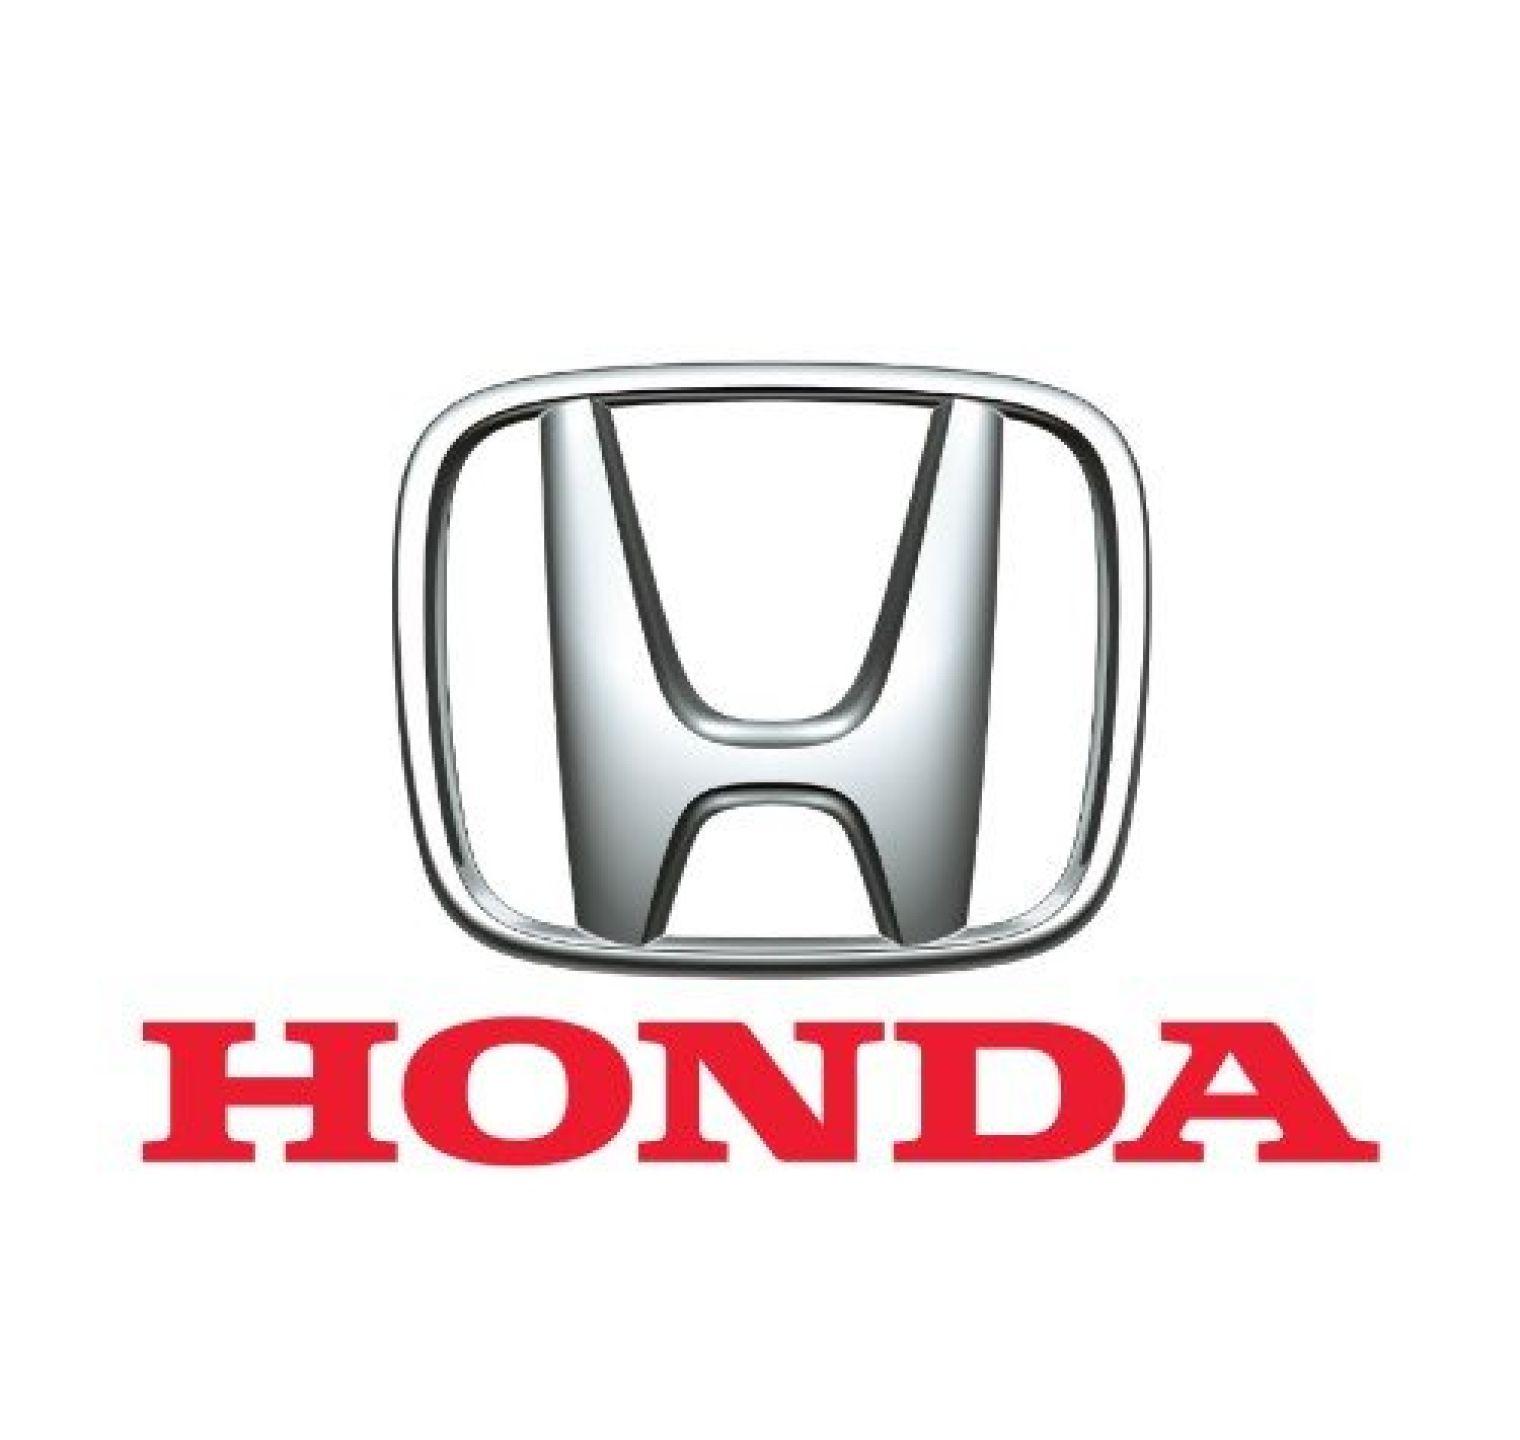 Honda Civic VI Hatchback (1995 t/m 2001) - achterruitenwisser Valeo Standard